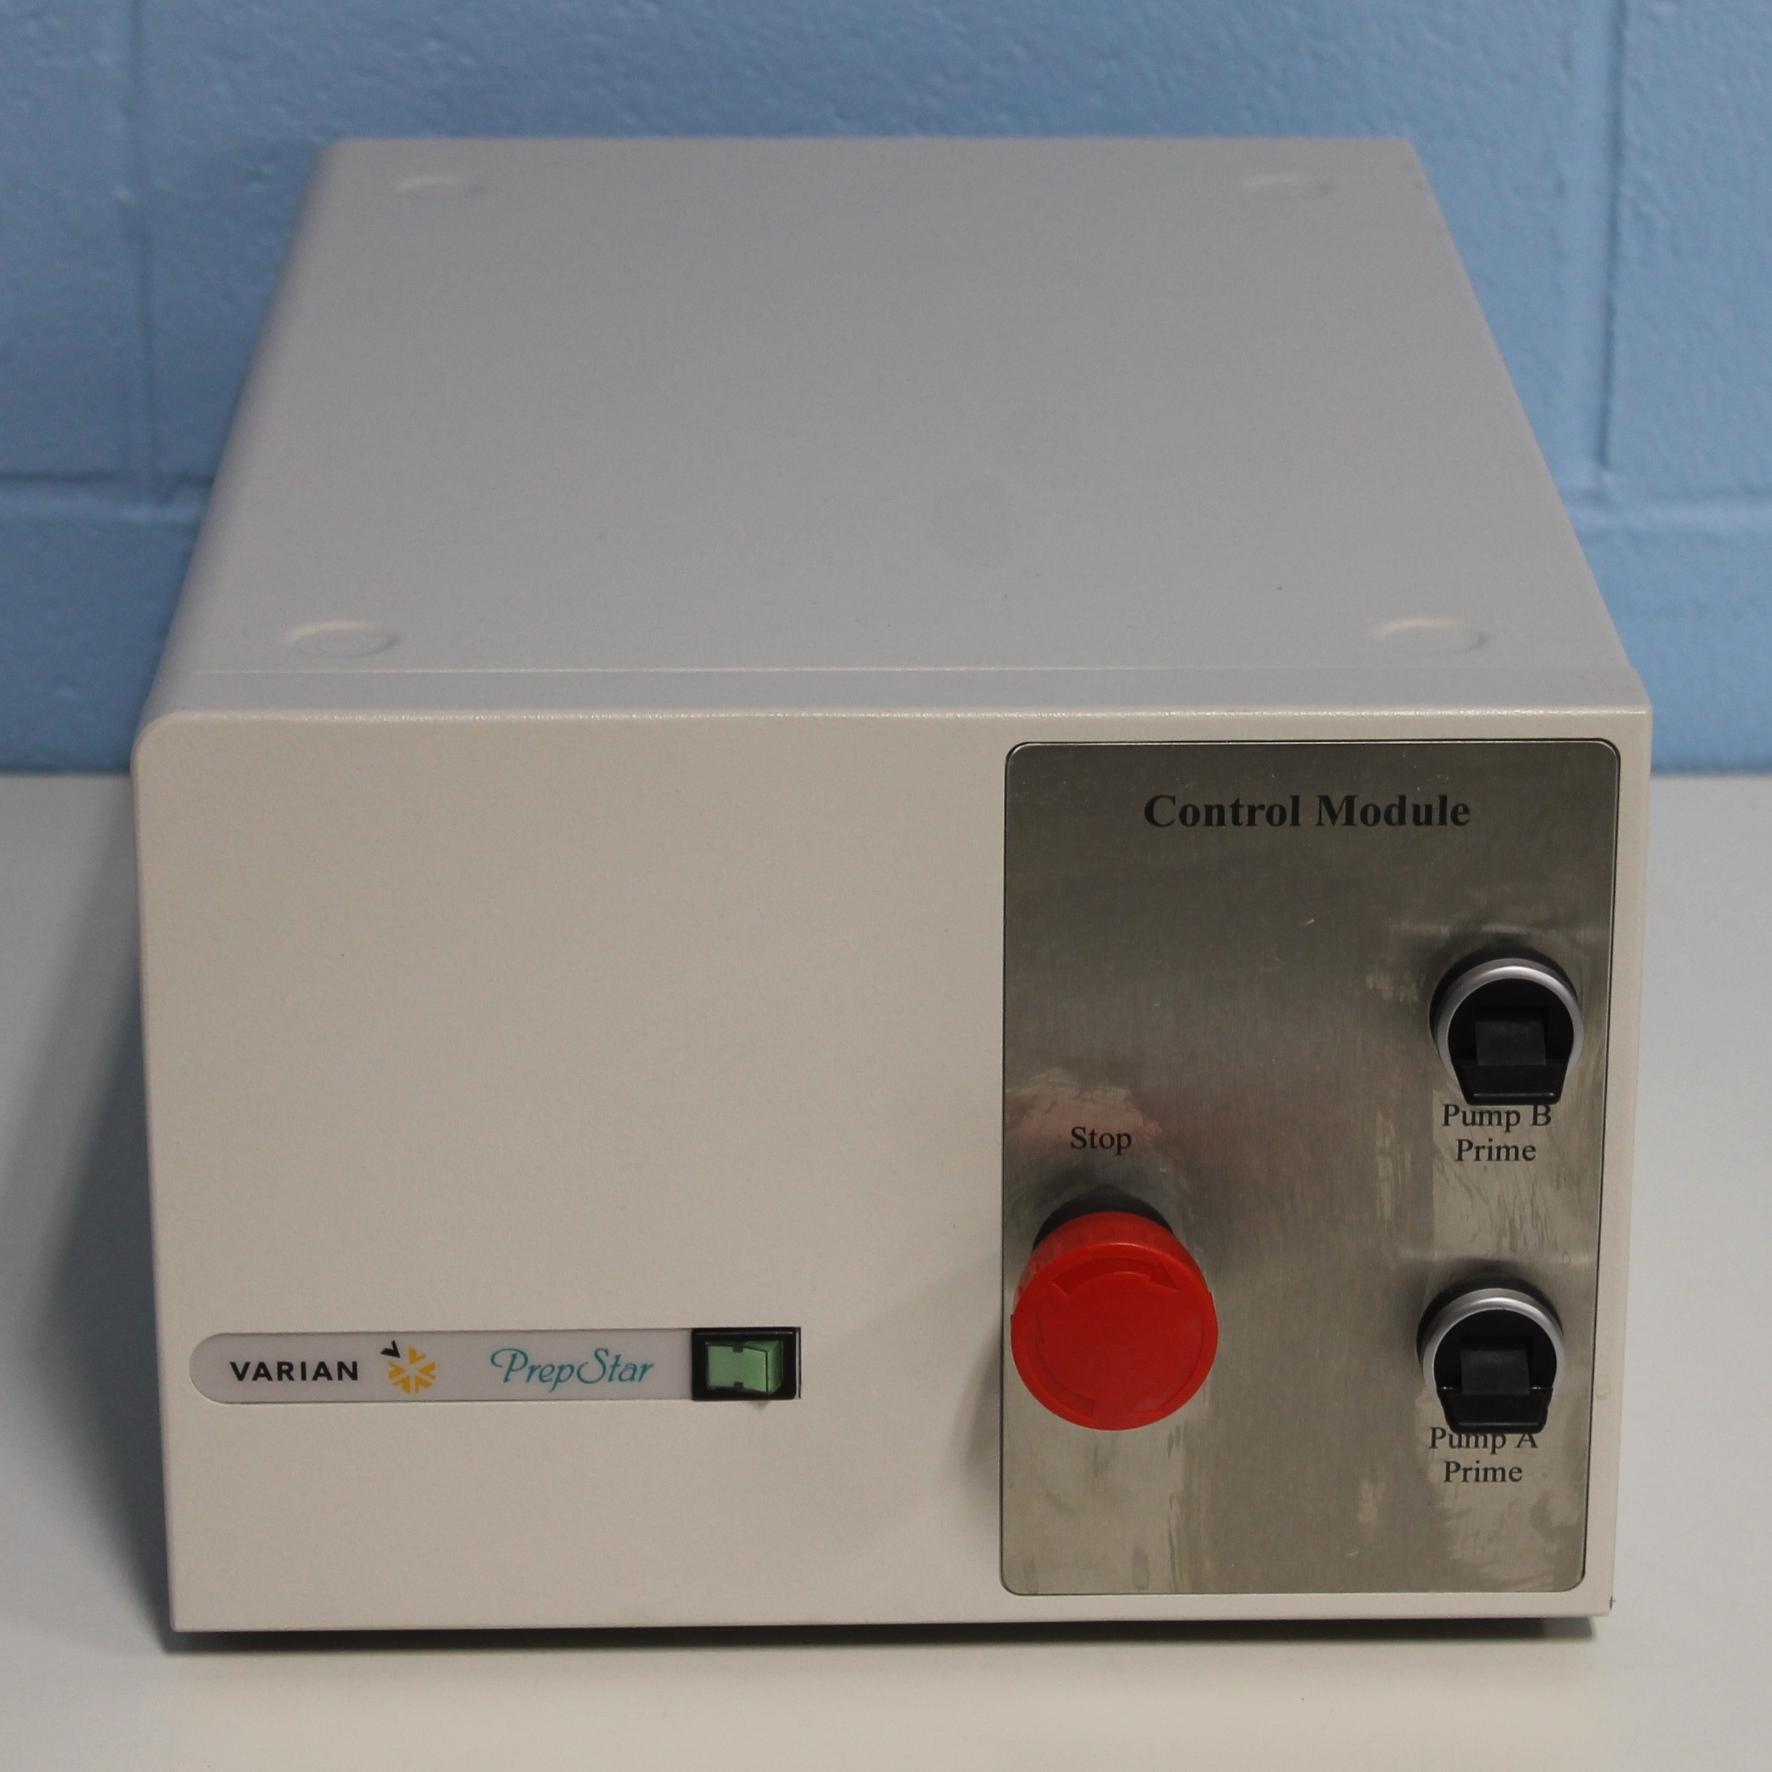 Varian Prepstar Control Module Image